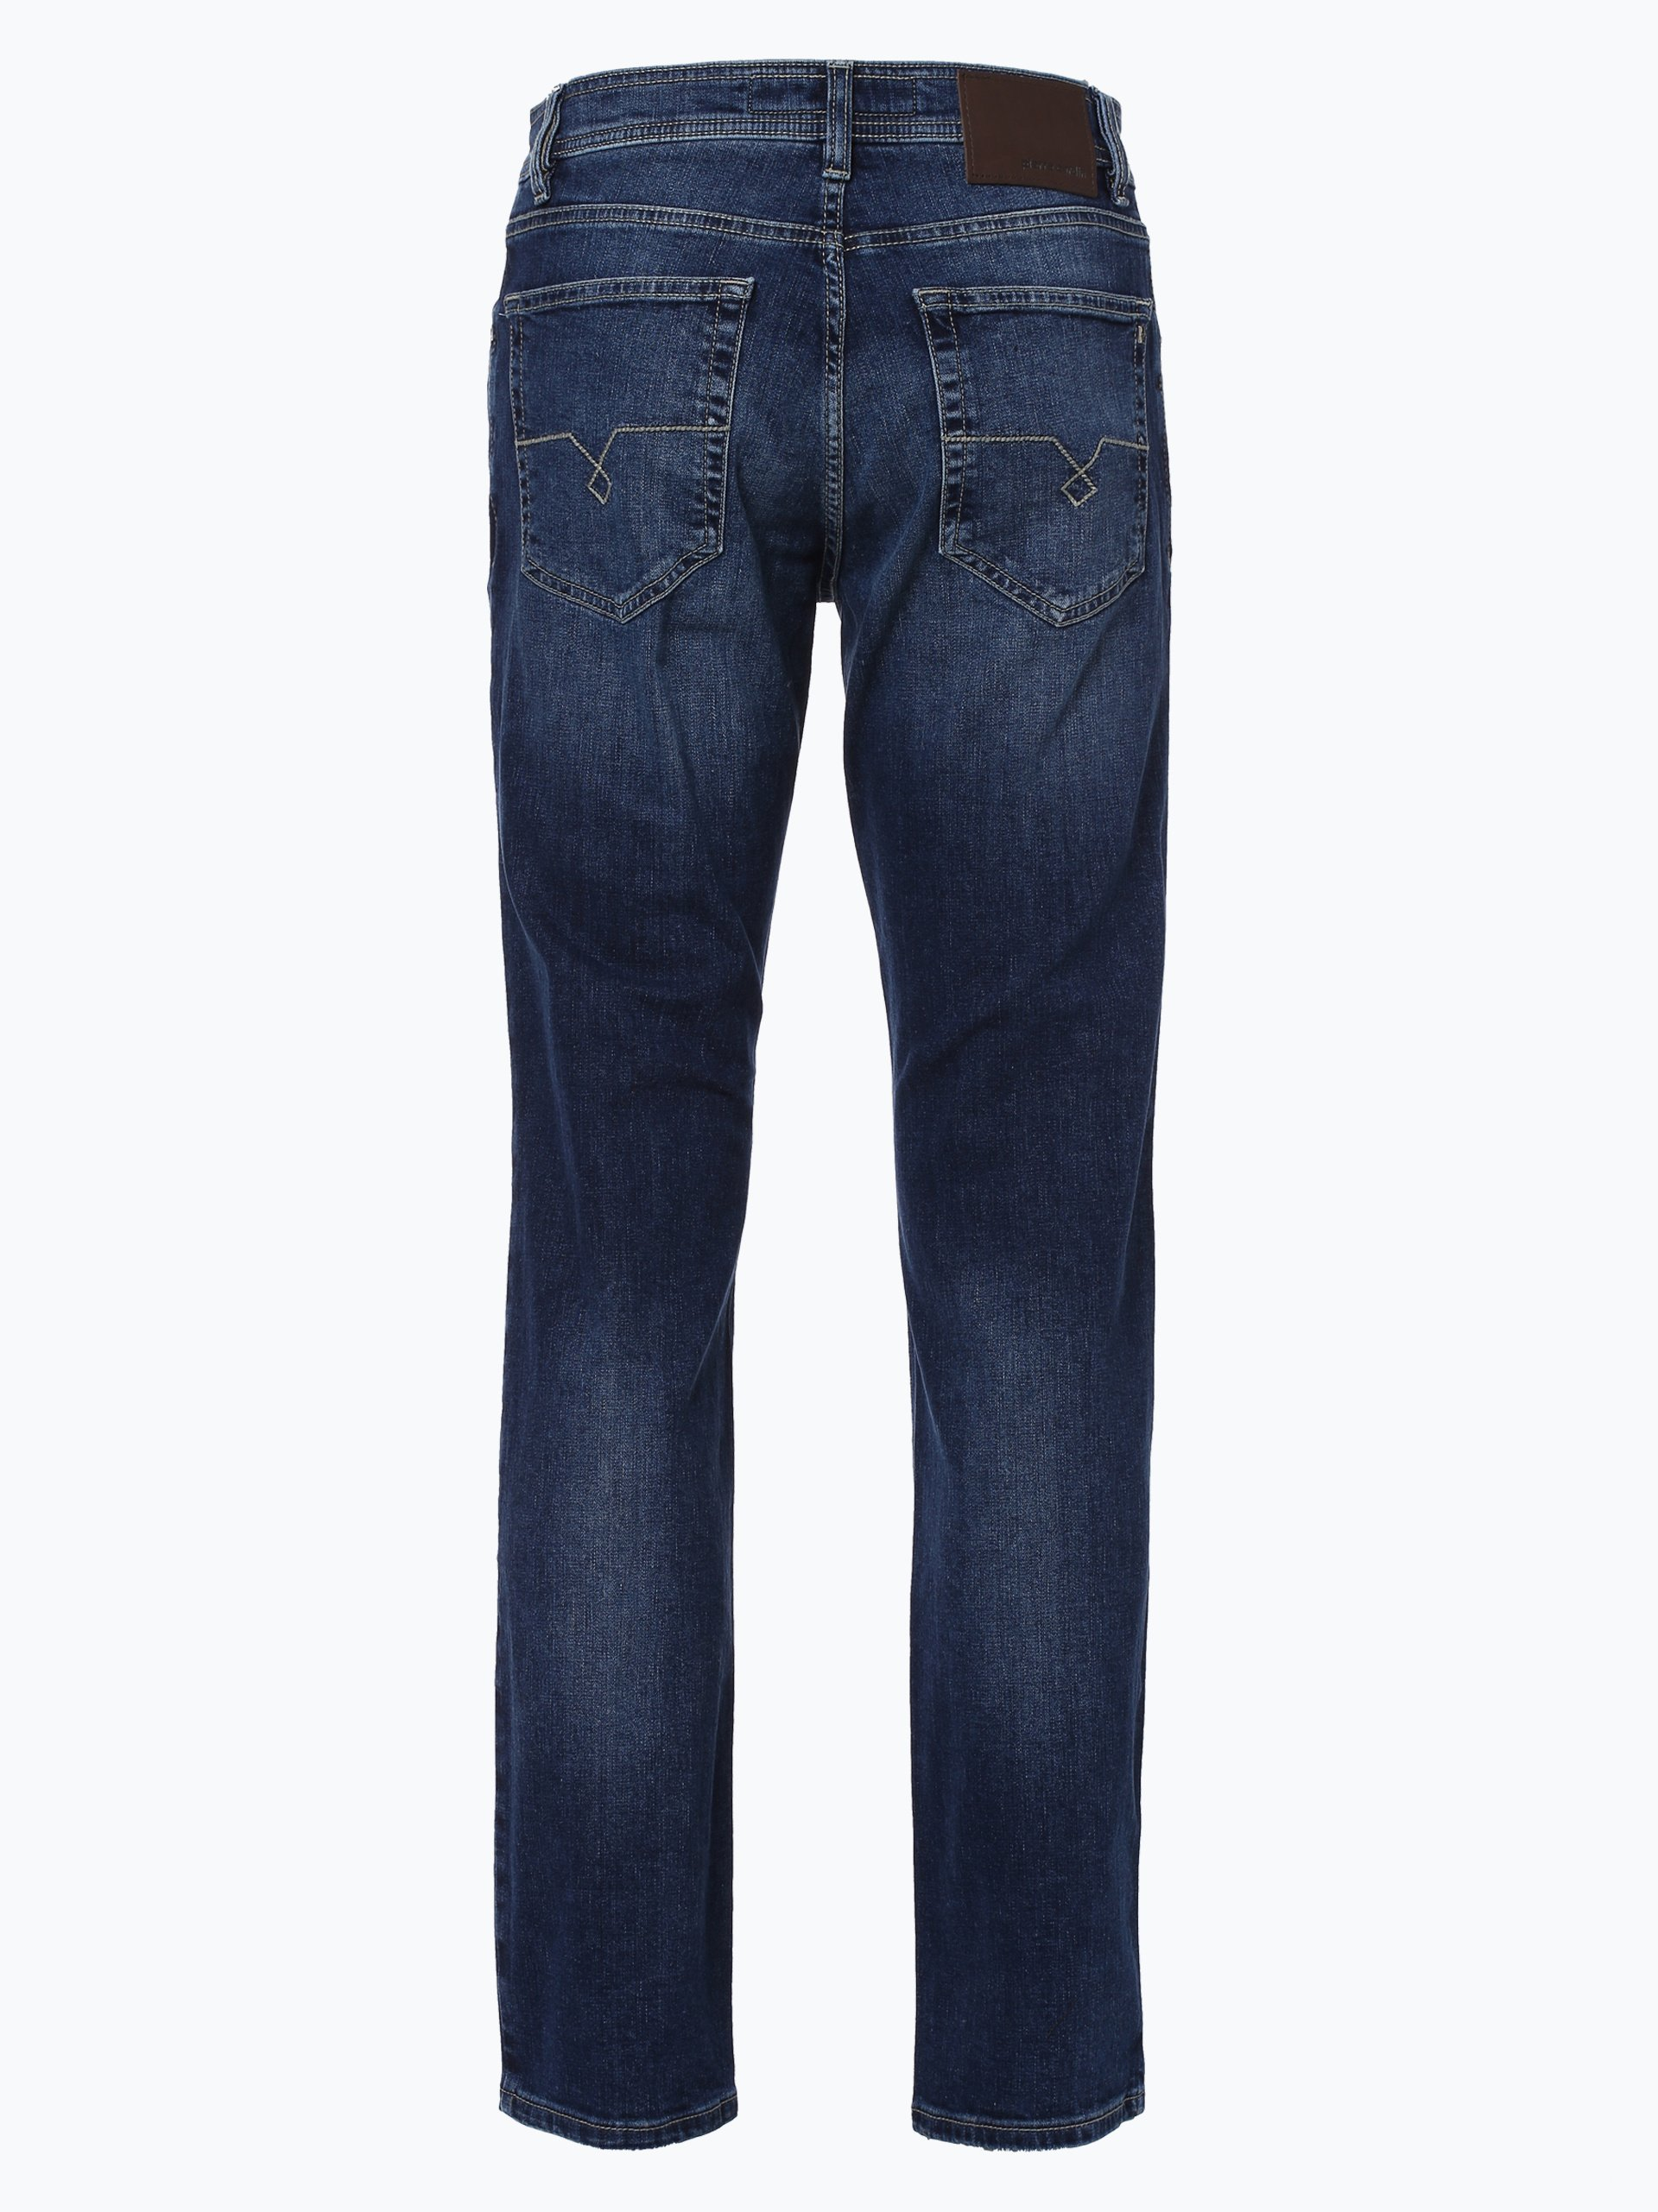 pierre cardin herren jeans deauville medium stone uni. Black Bedroom Furniture Sets. Home Design Ideas